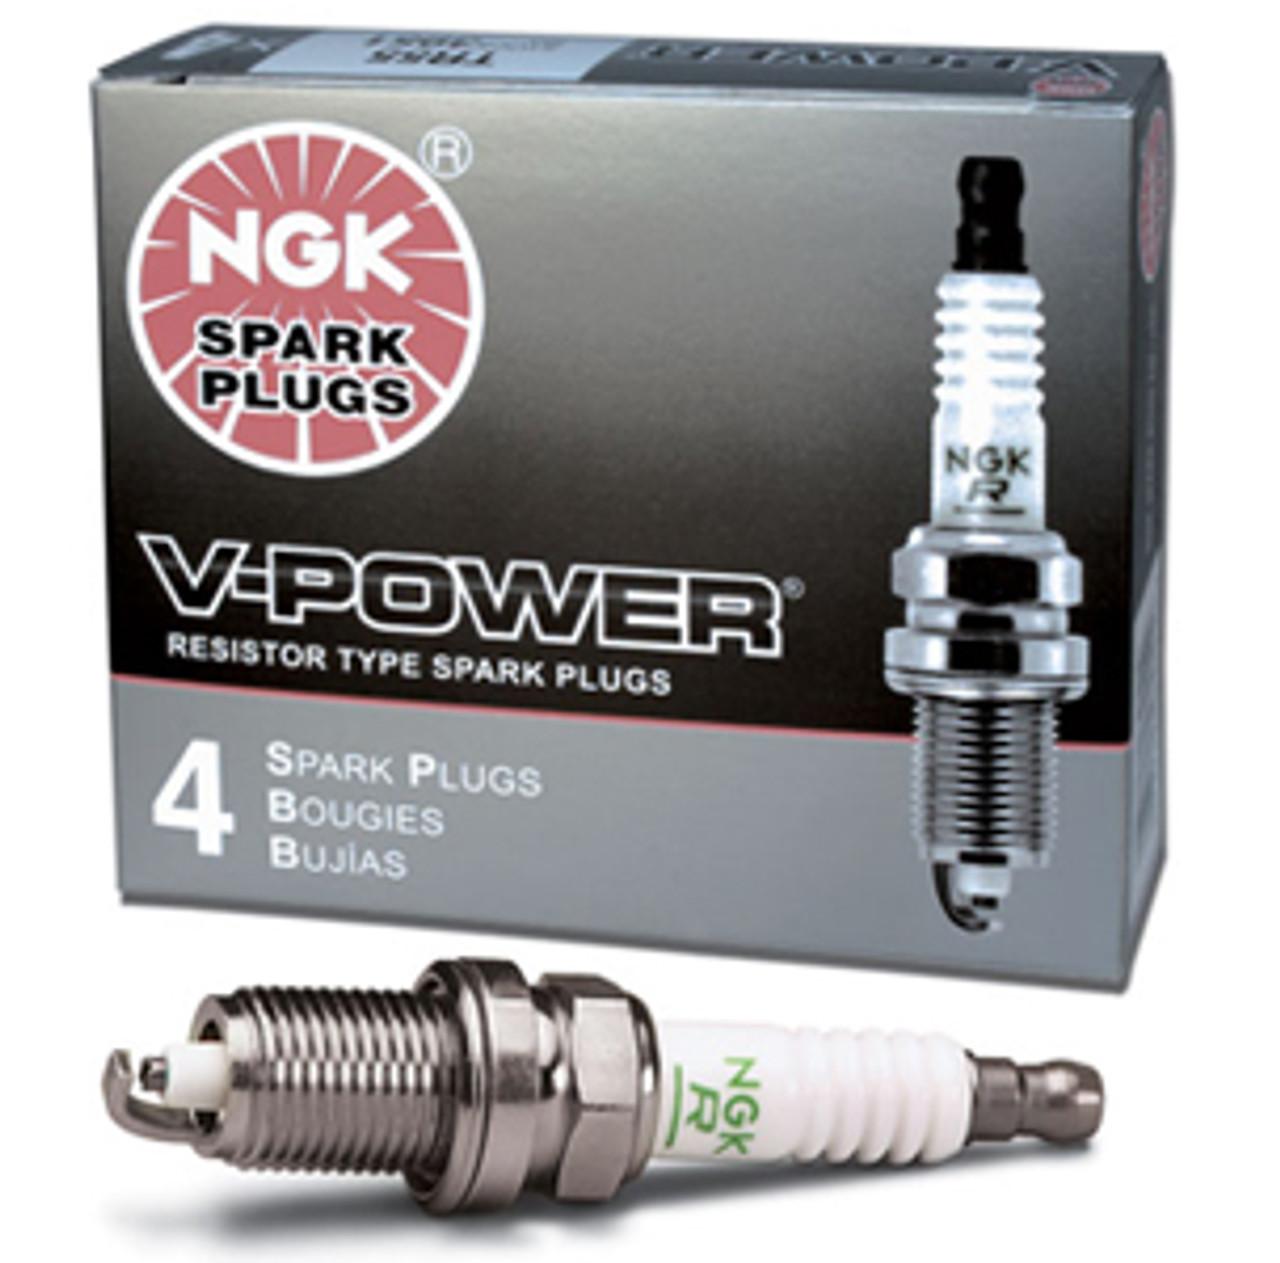 NGK V-Power TR-6 Spark Plugs (Set of 8) - GM LSx V8 (One Step Colder for  Forced Induction/Nitrous)